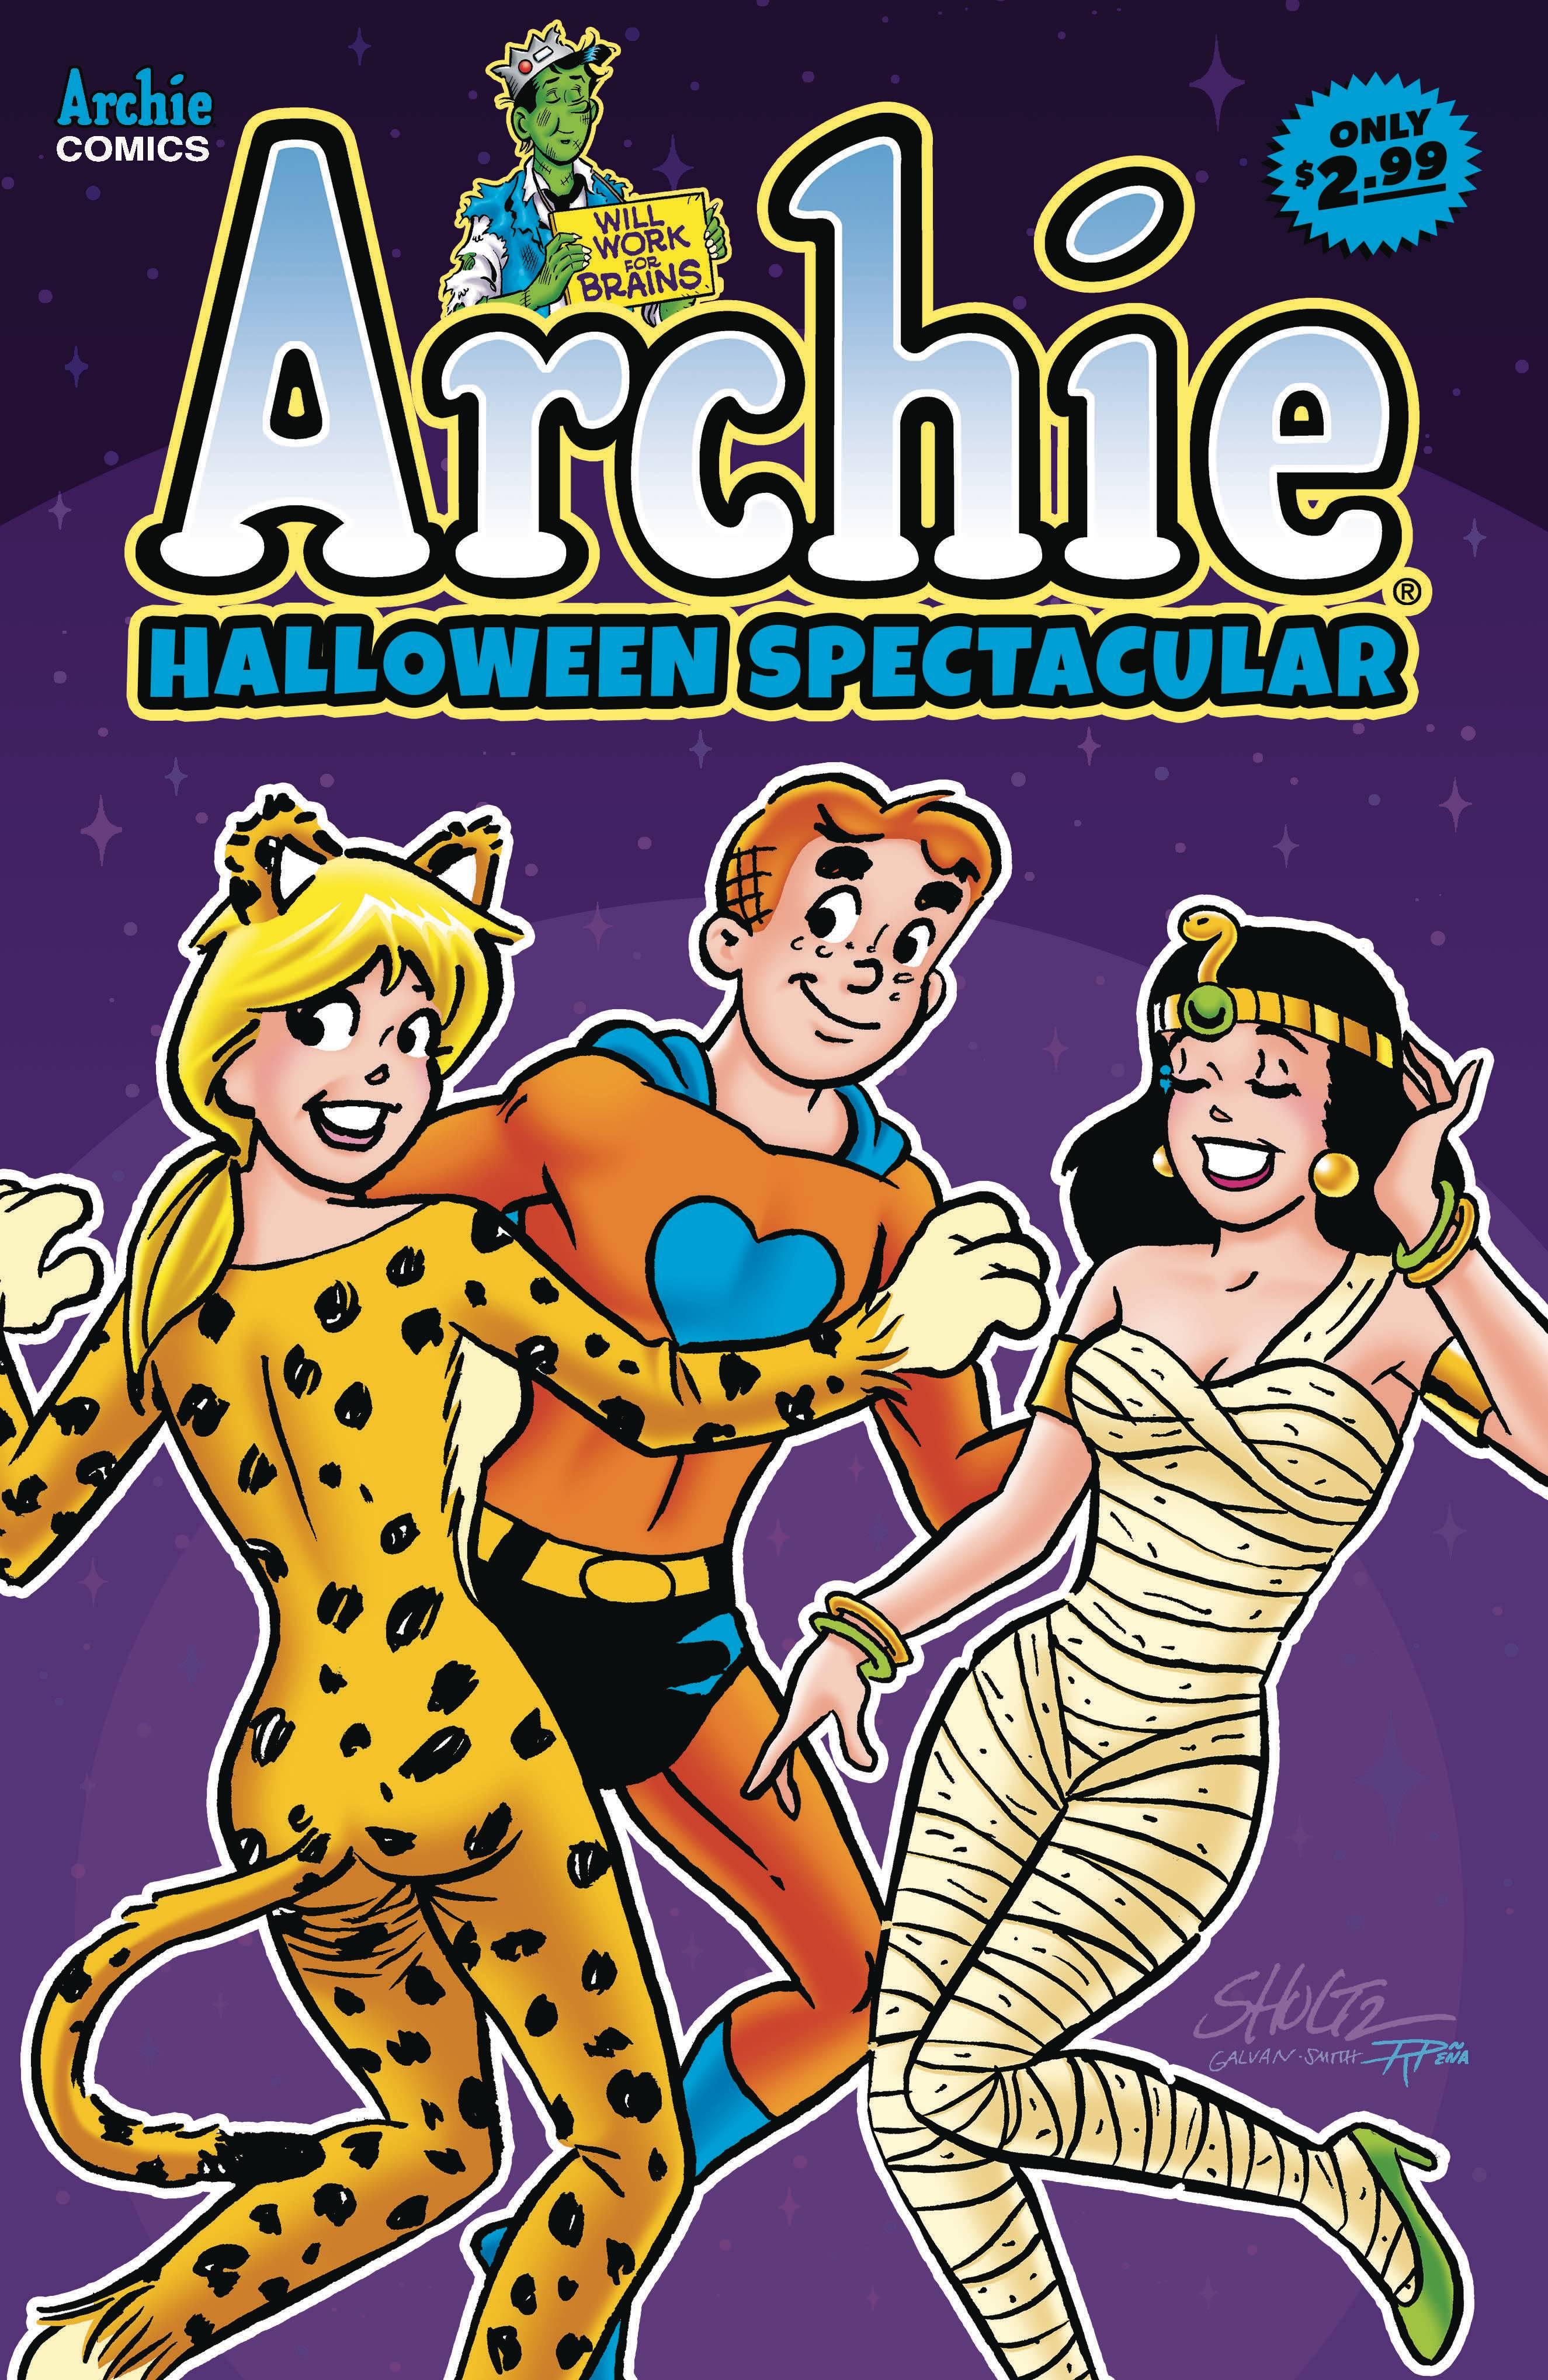 Archies Halloween Spectacular #1 (2020)